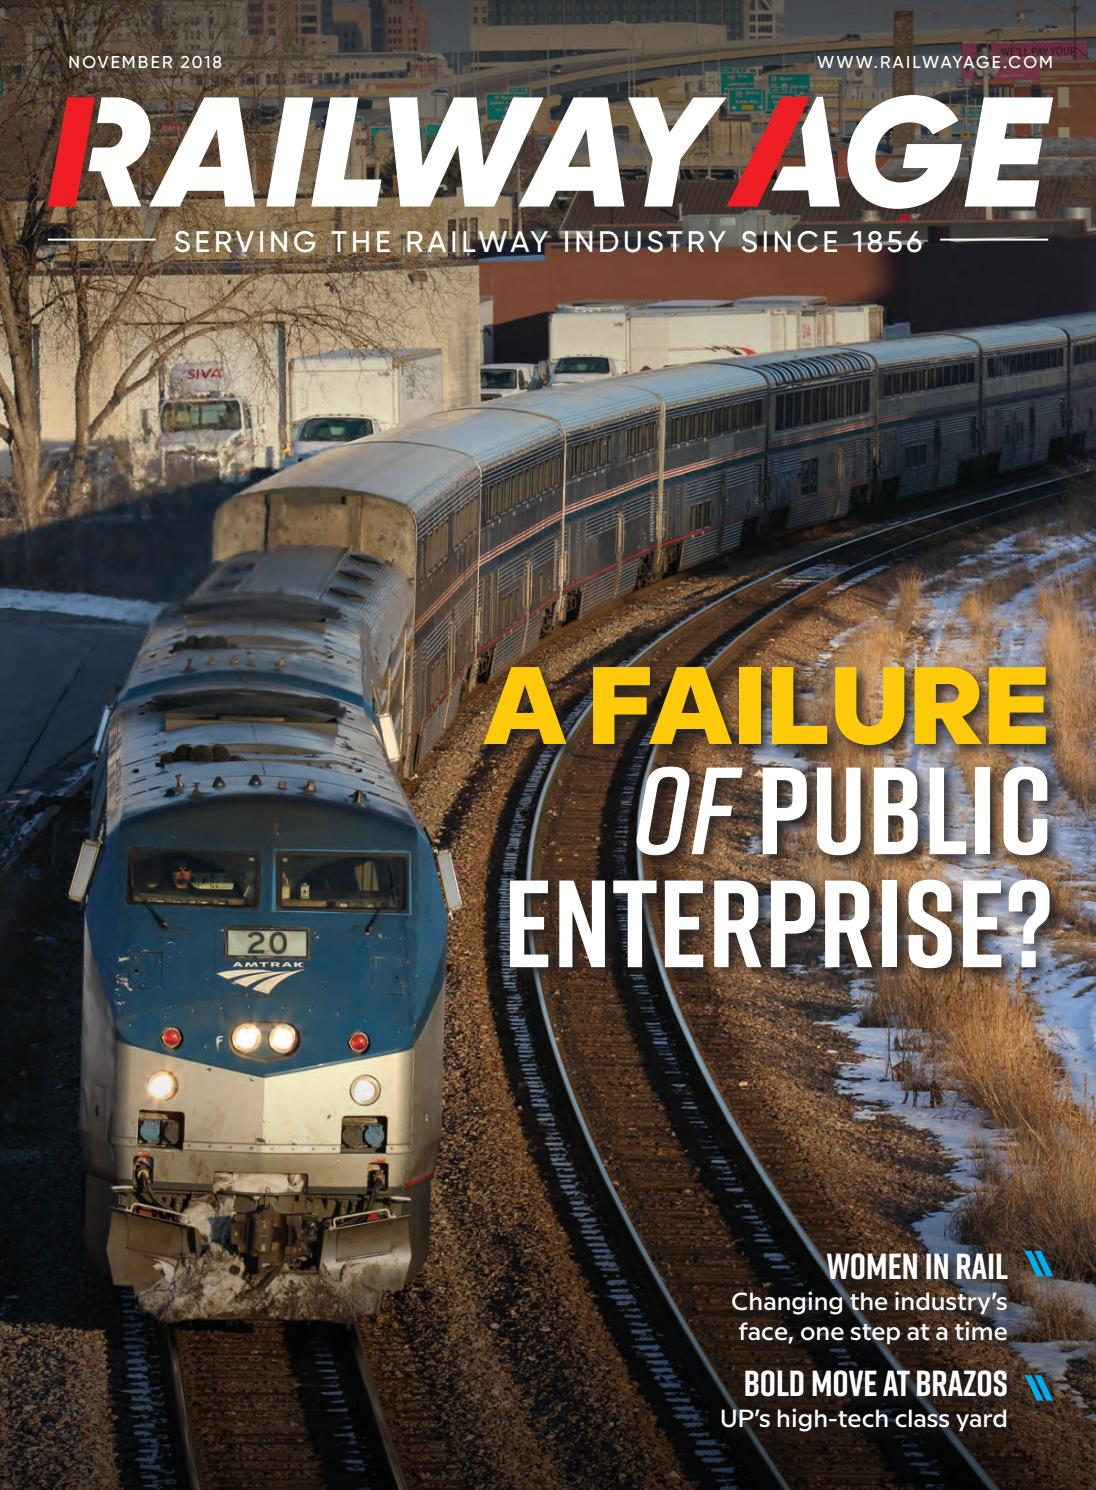 Railway Age November 2018 by Railway Age - issuu